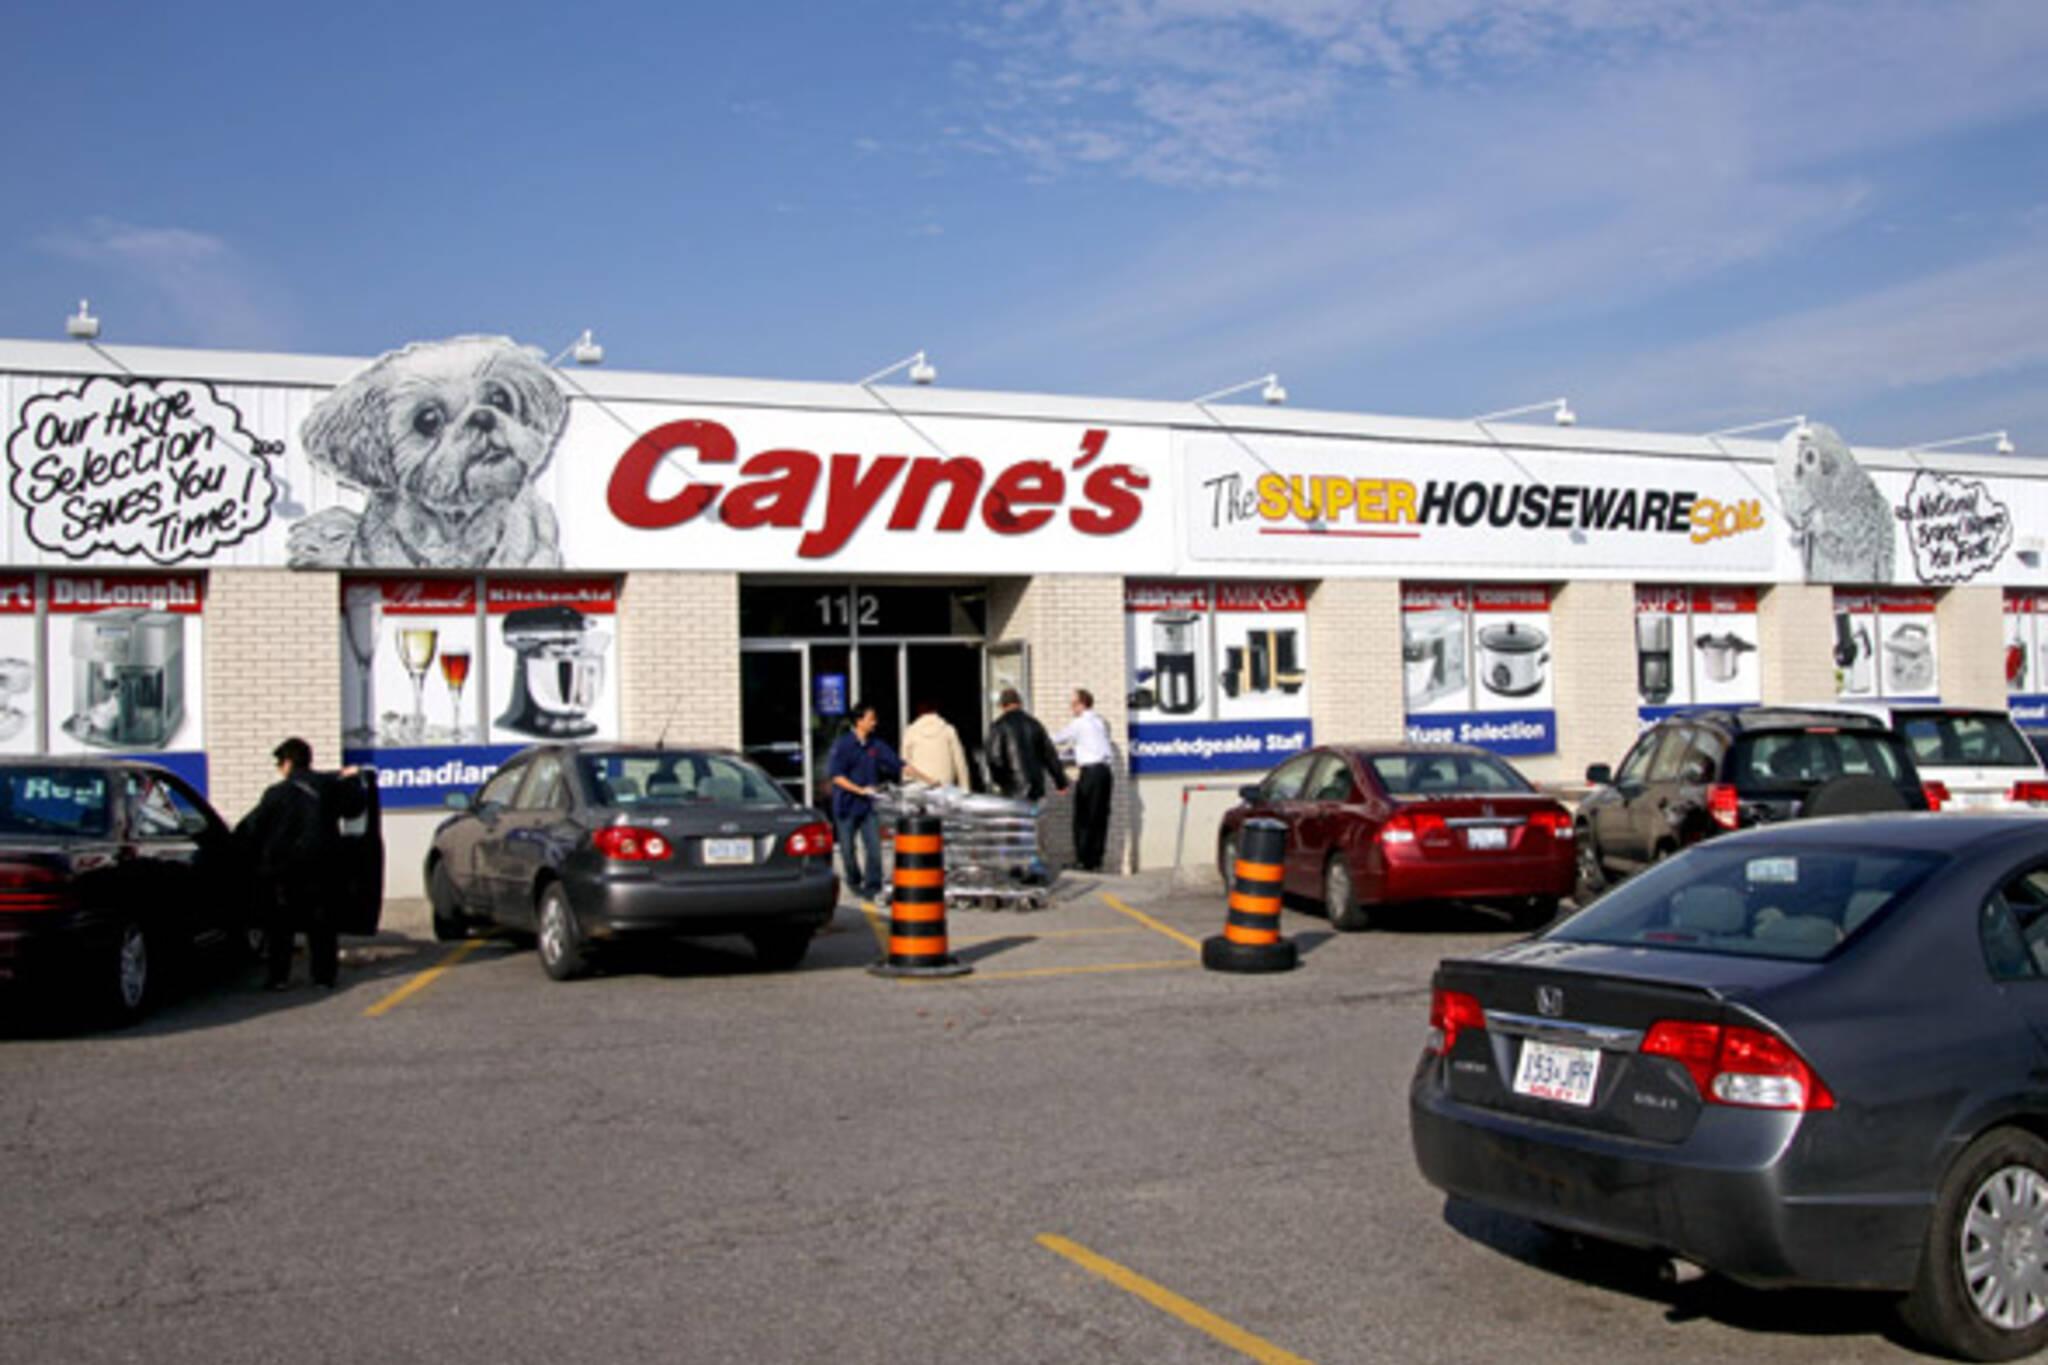 Cayne's